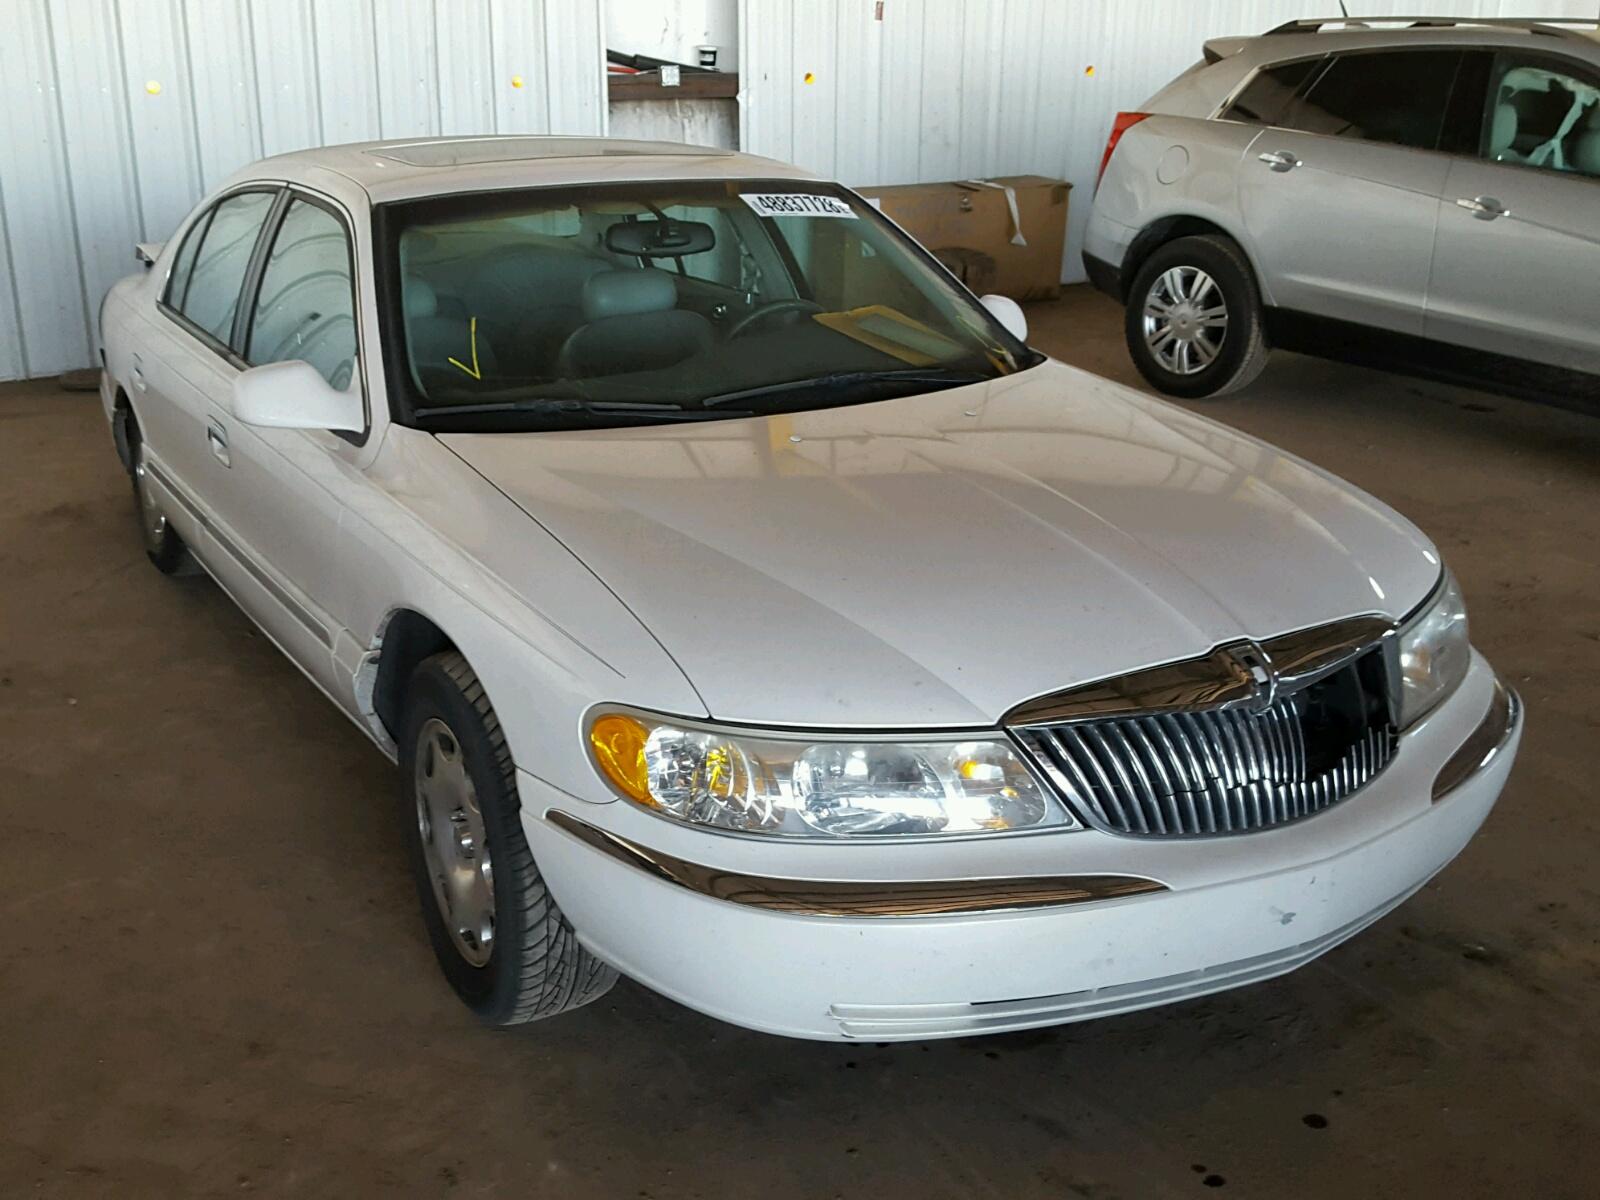 1998 Lincoln Continental For Sale At Copart Phoenix  Az